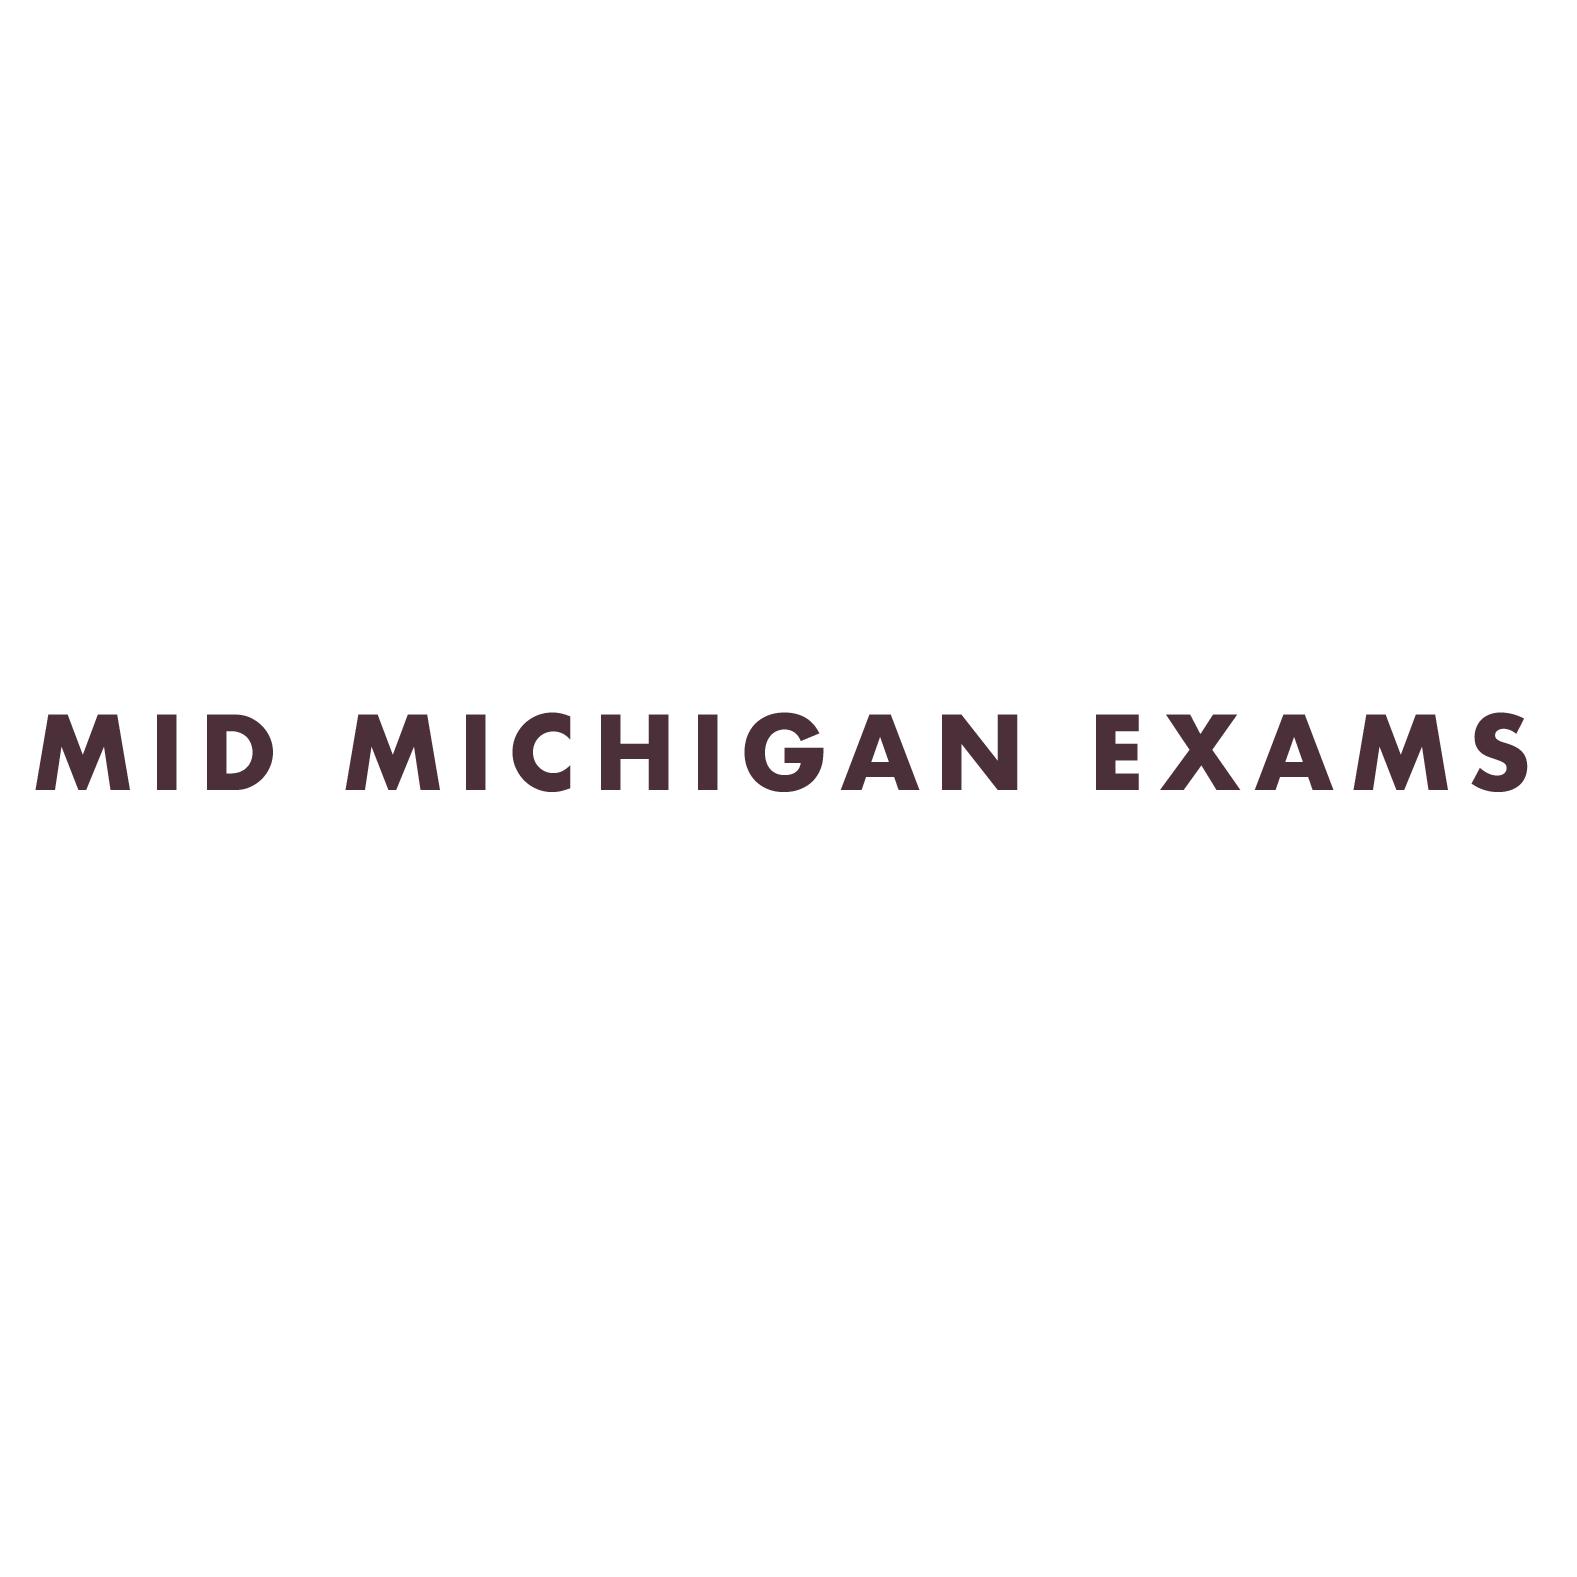 Mid Michigan Exams